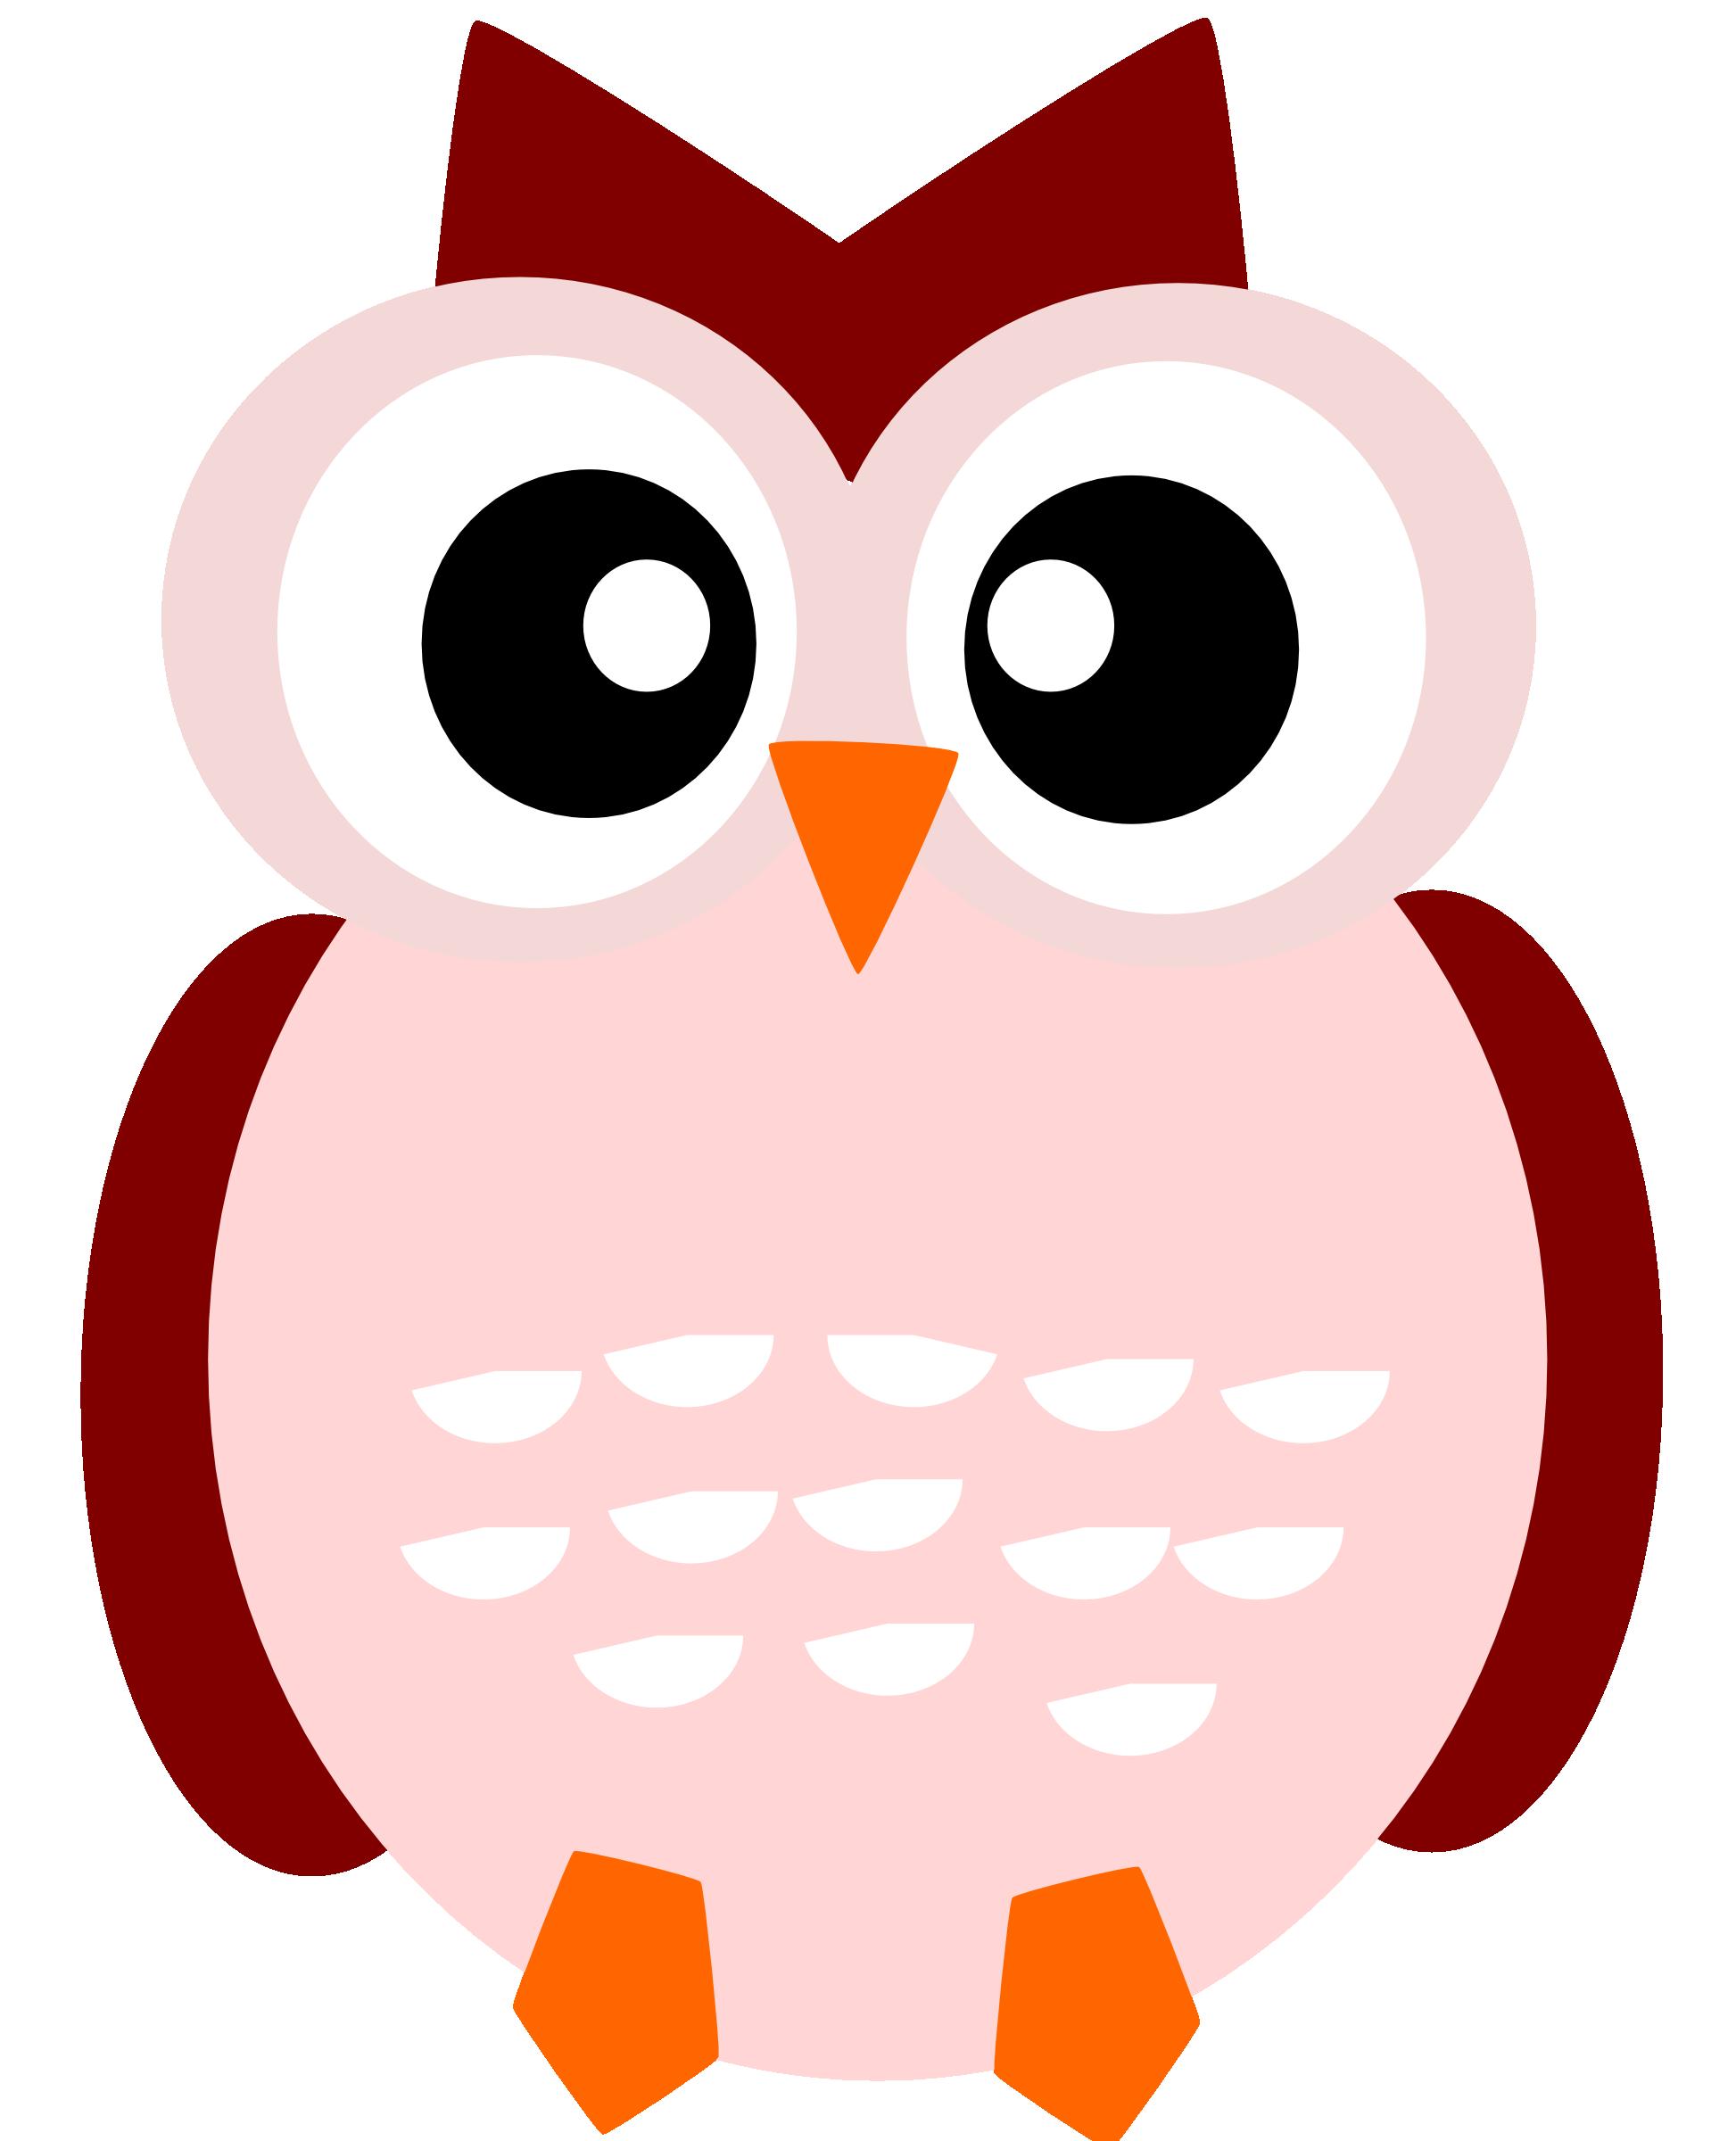 Owls clipart smart. On owl clip art